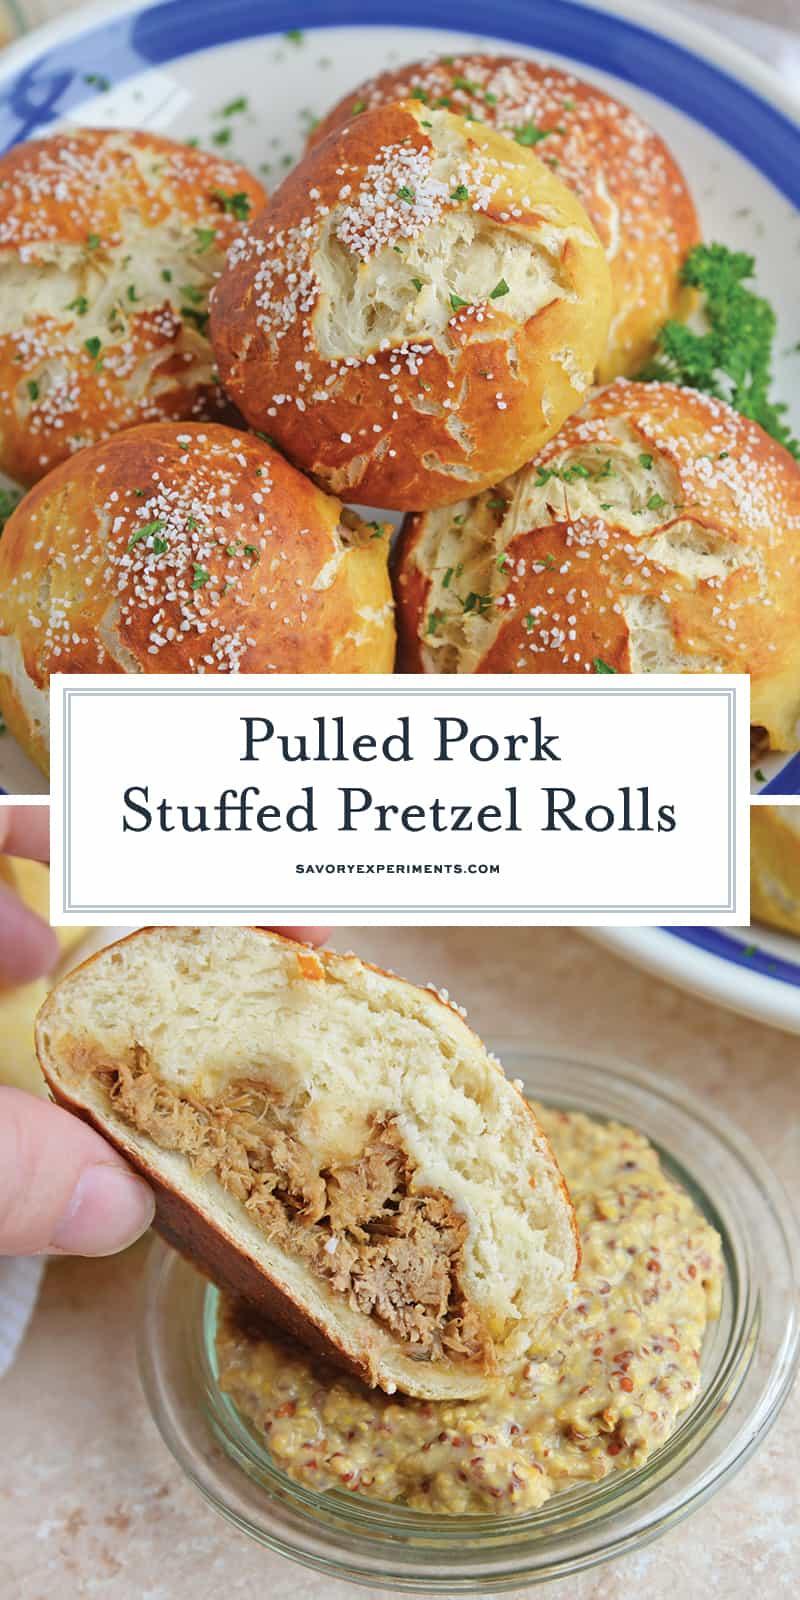 Pulled Pork Stuffed Pretzel Rolls for Pinterest